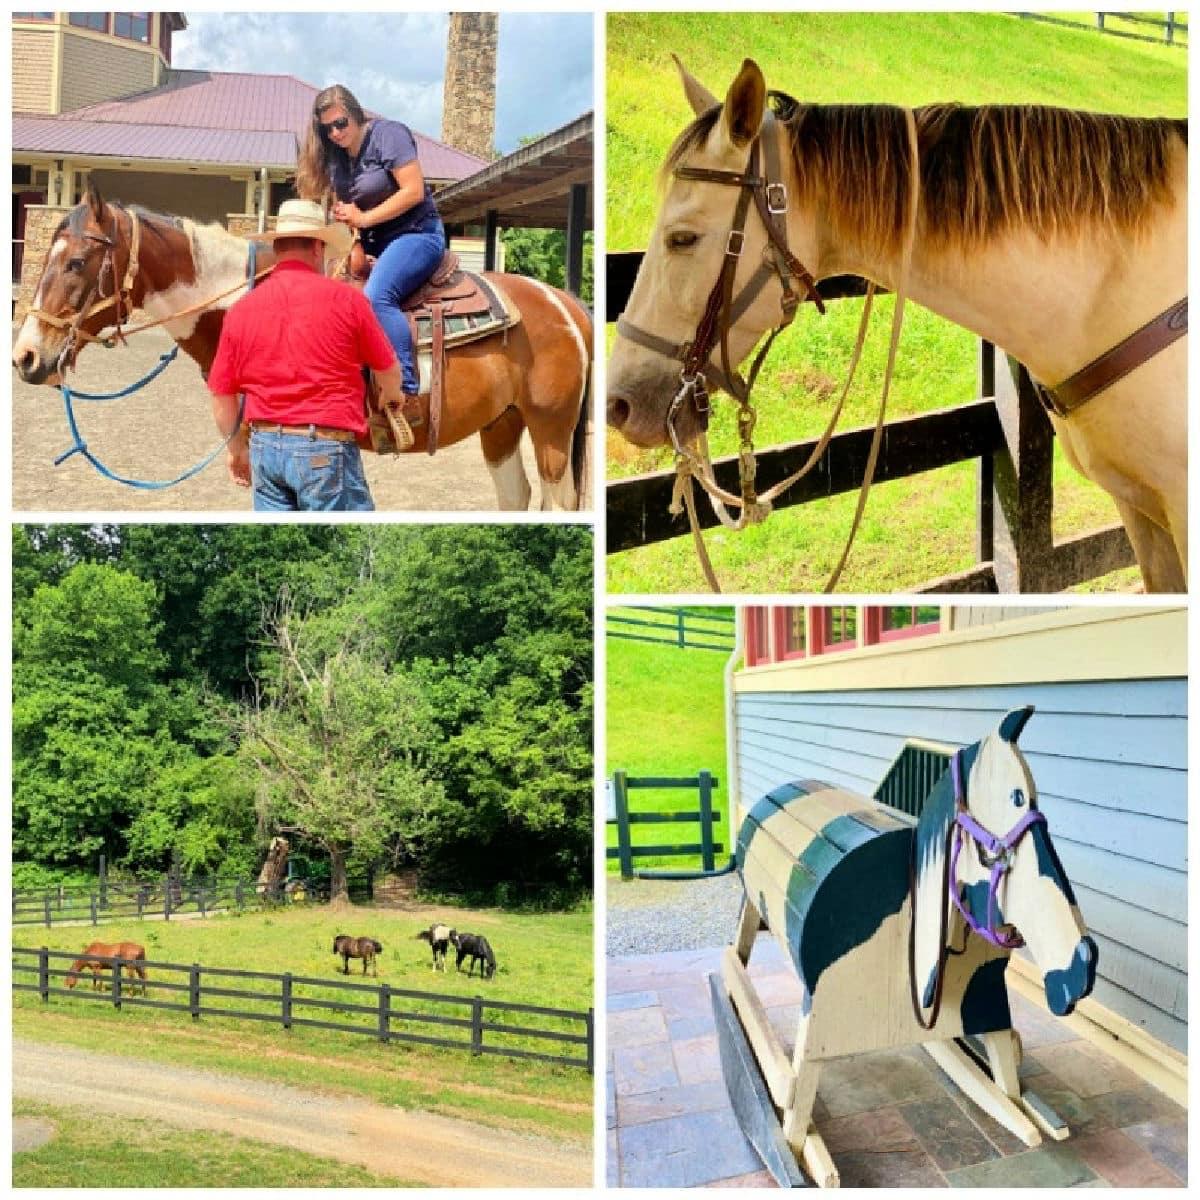 Brasstown stables horses